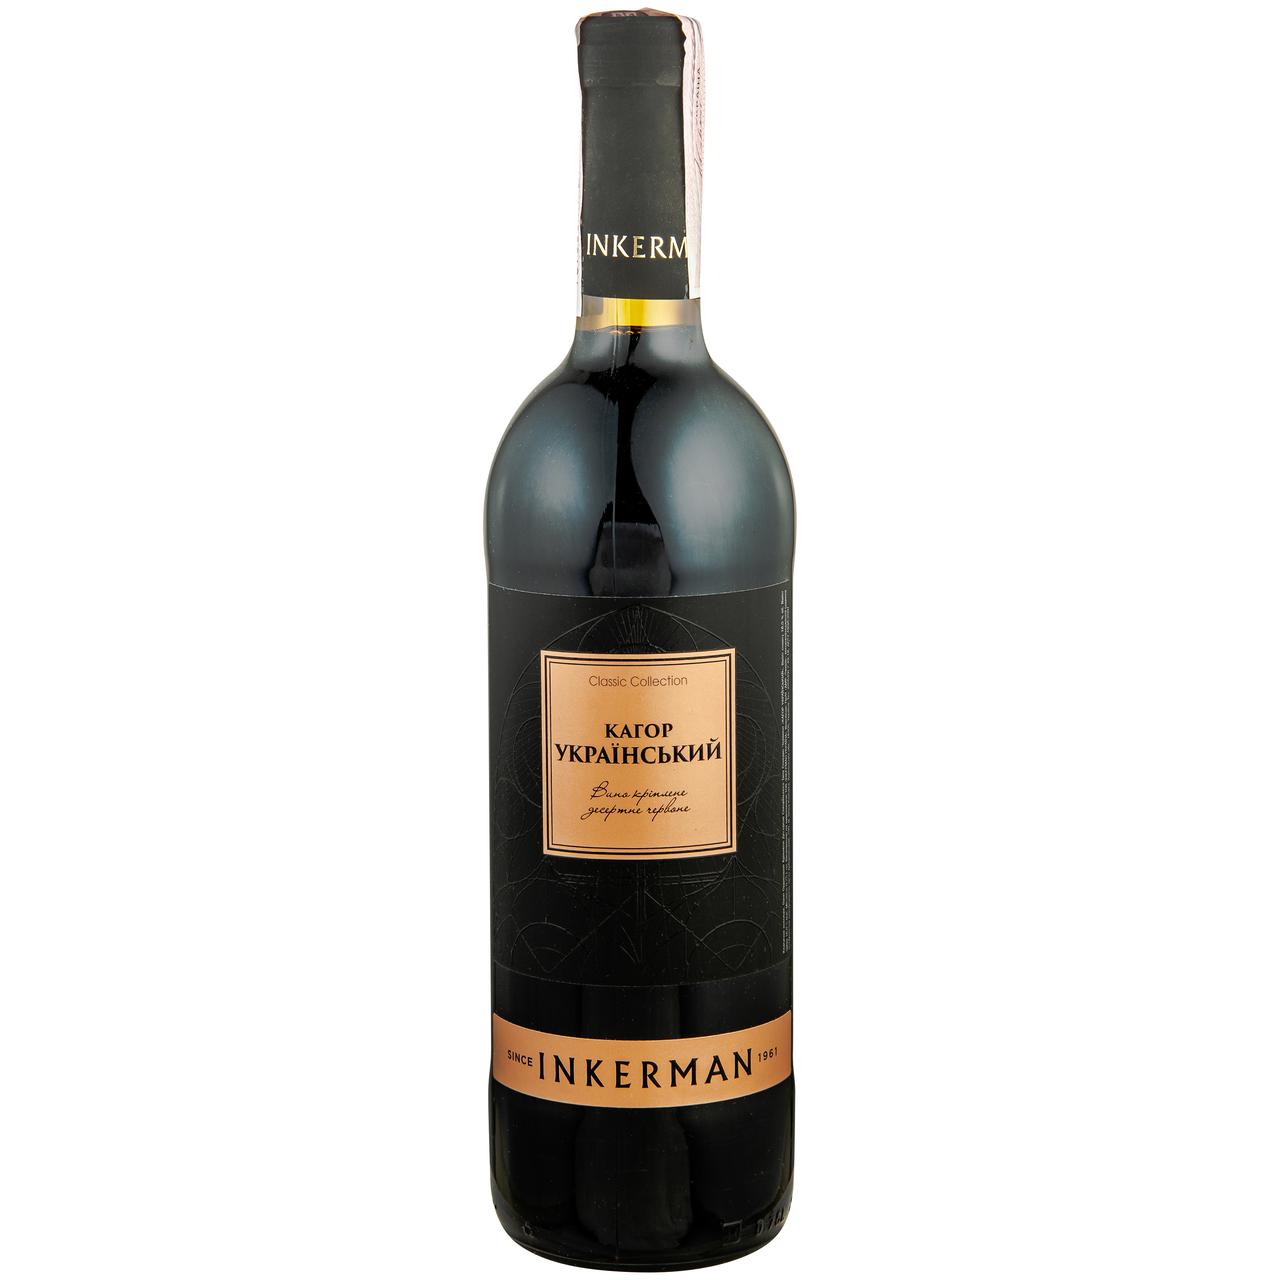 Вино Inkerman Кагор Український червоне солодке 16% 0.75л